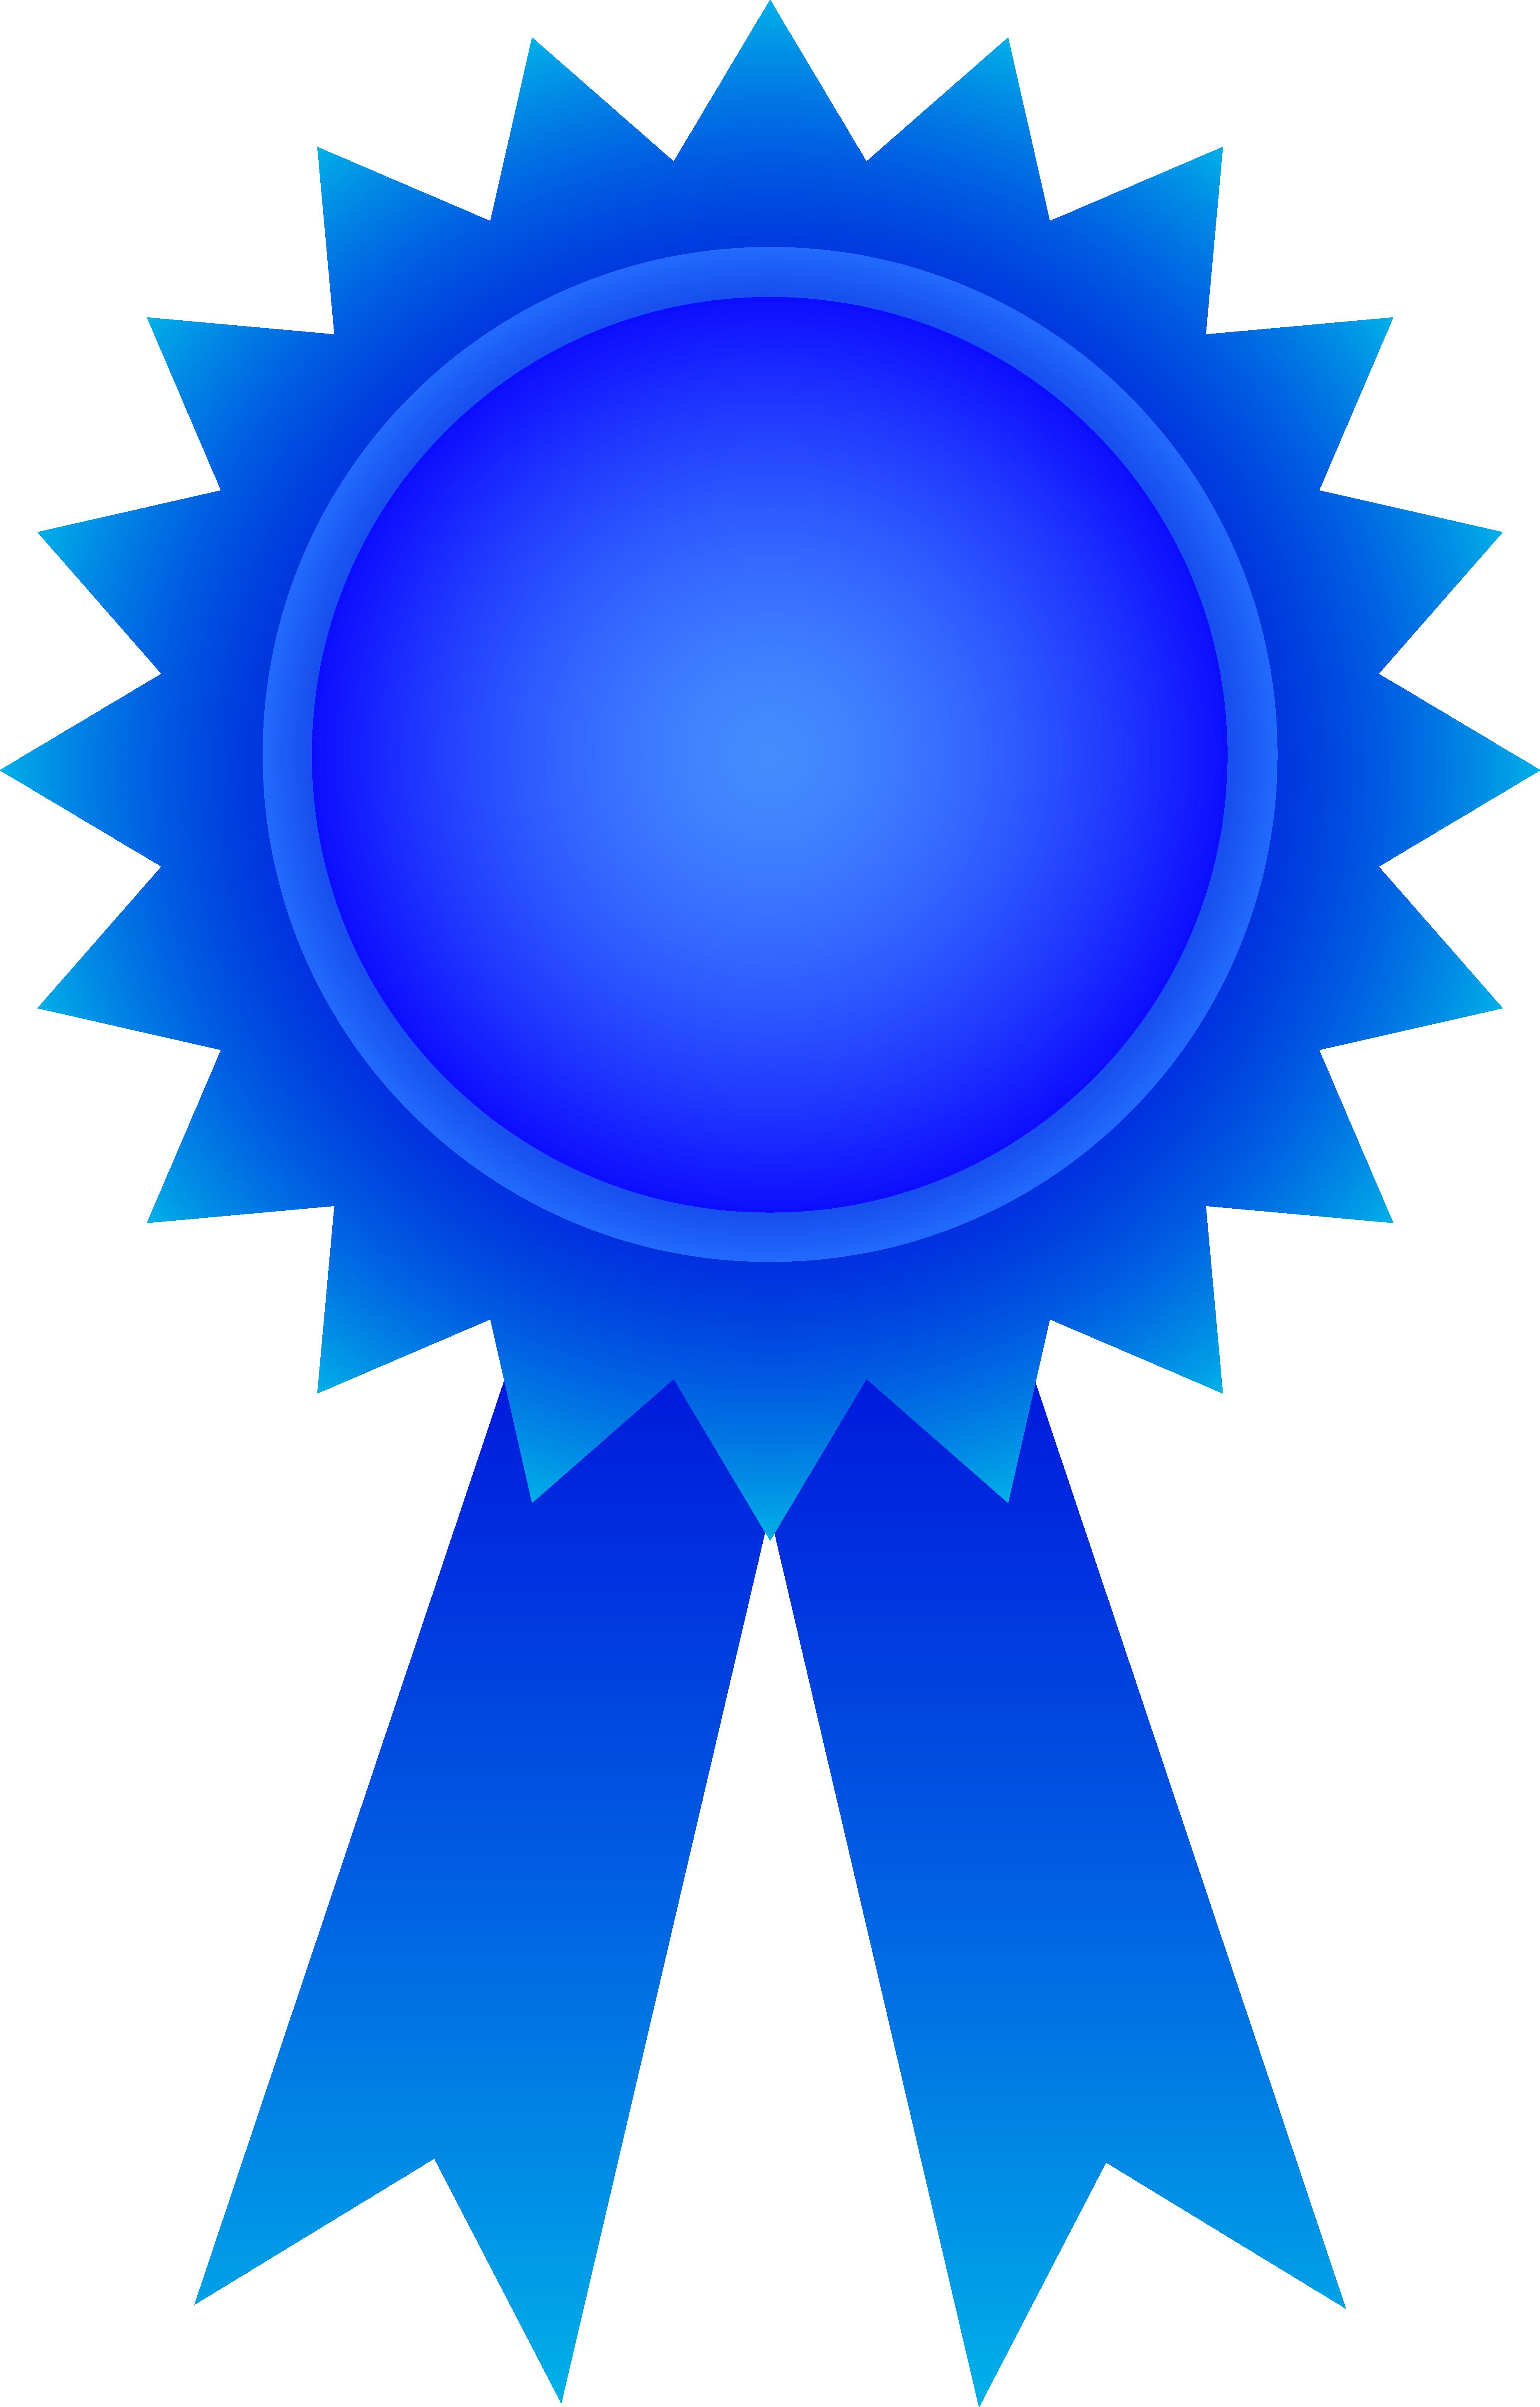 Free clipart images of blue ribbon award image freeuse library Blue Award Ribbon Free clipart free image image freeuse library